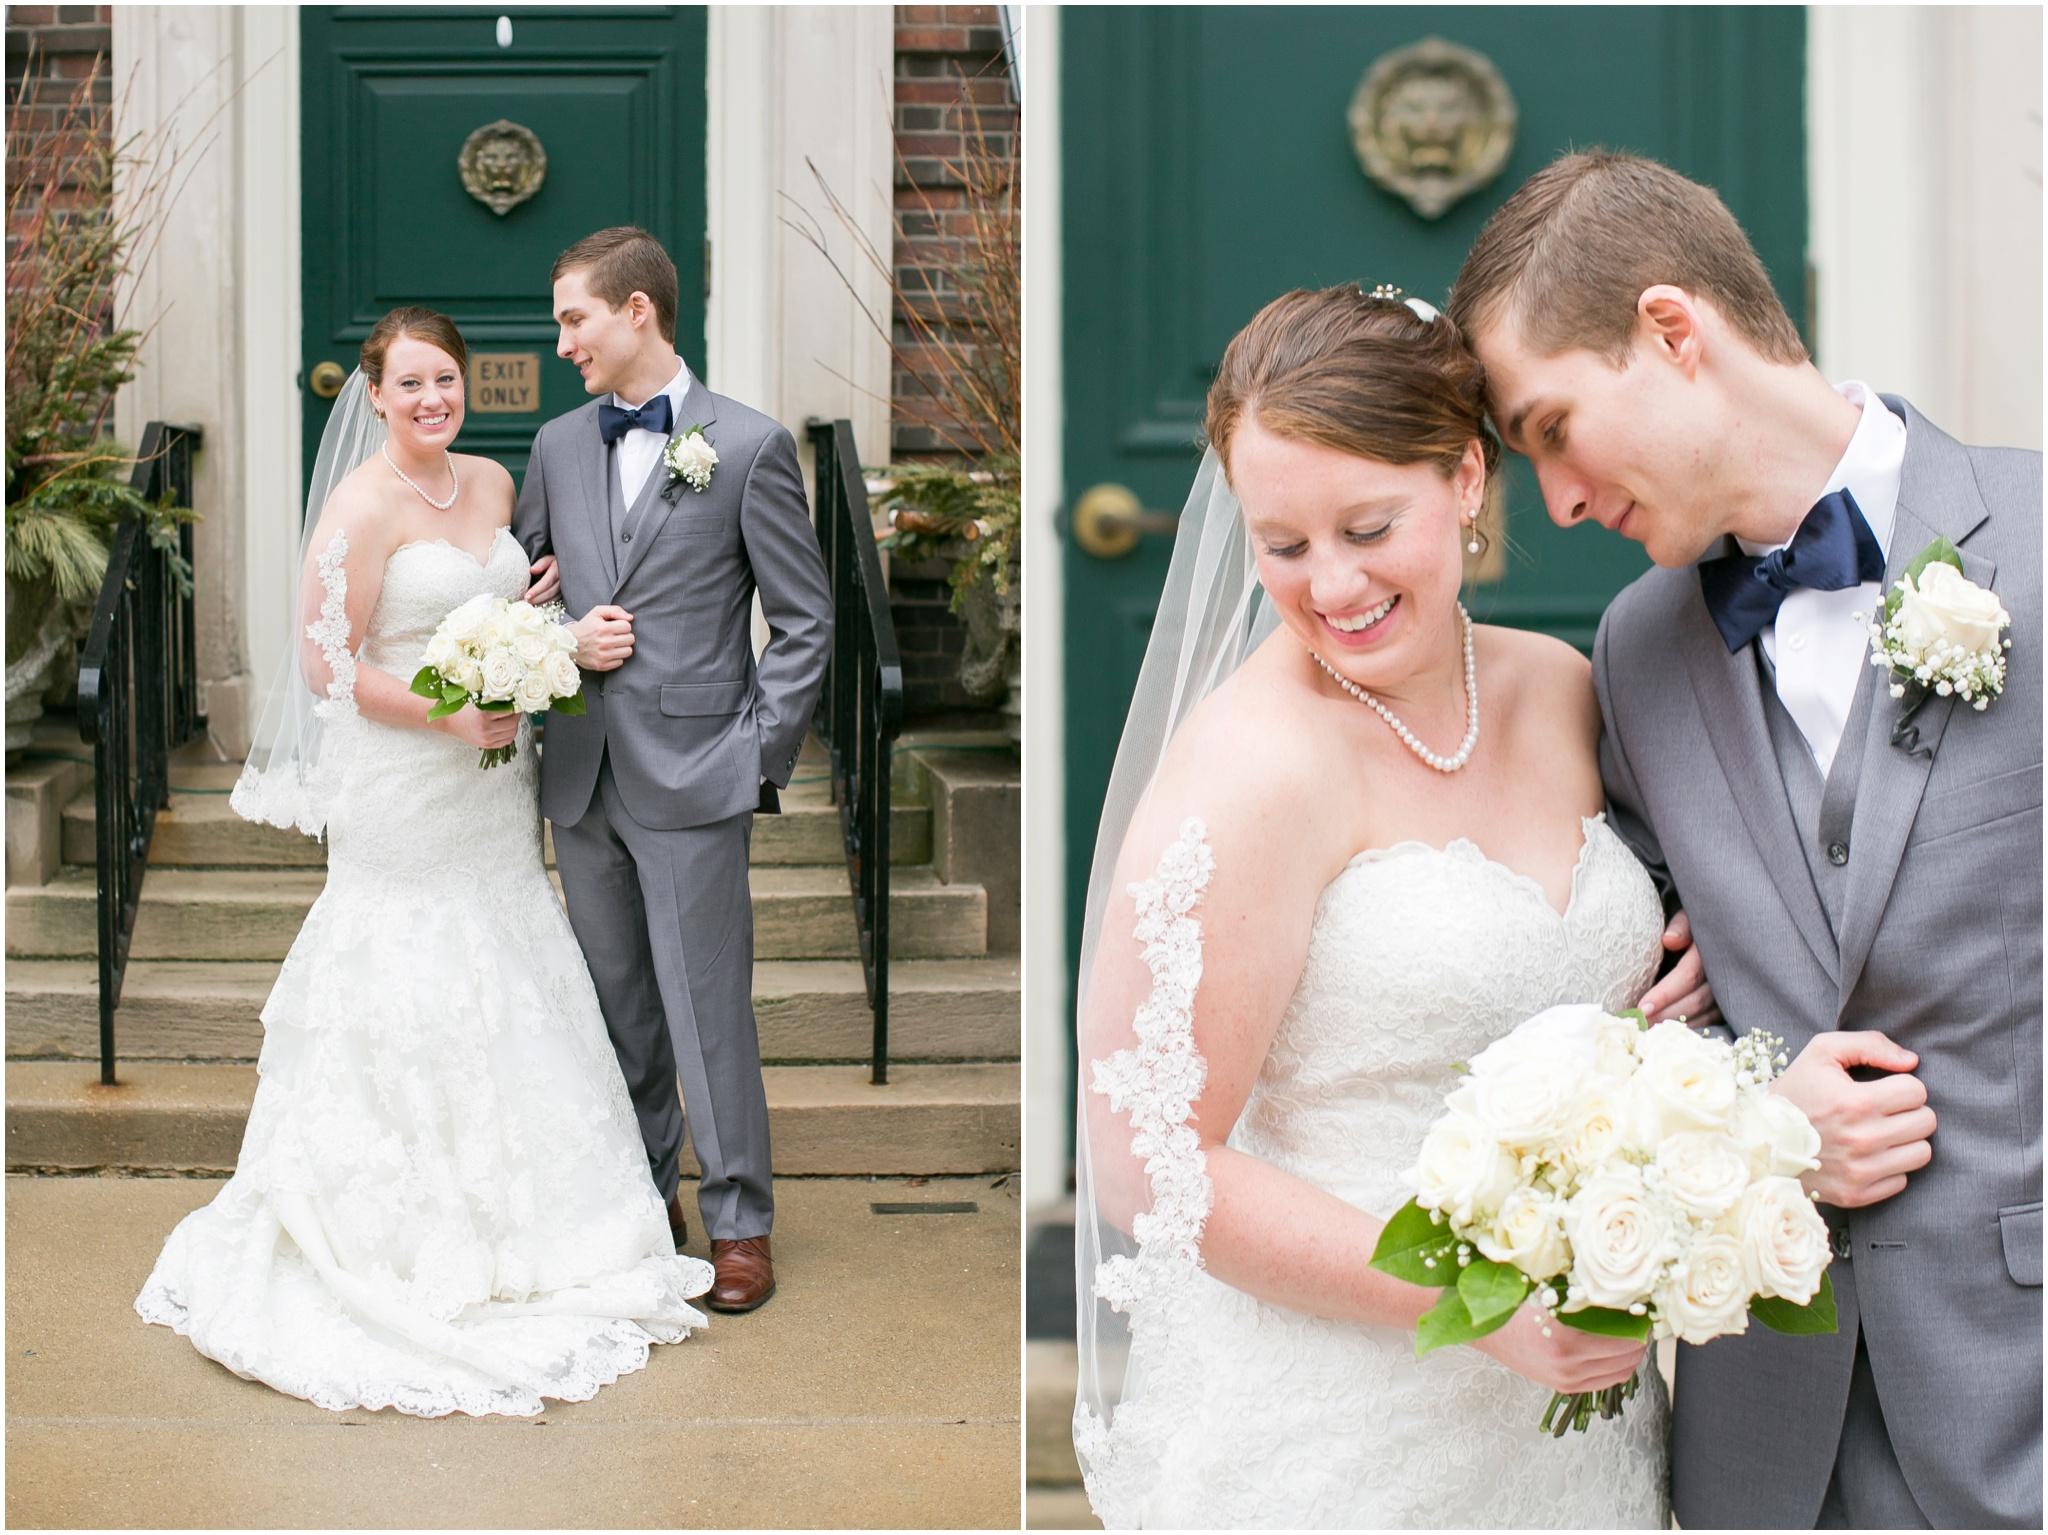 Madison_Club_Madison_Wisconsin_Wedding_Photographer_Spring_Rainy_Wedding_2622.jpg